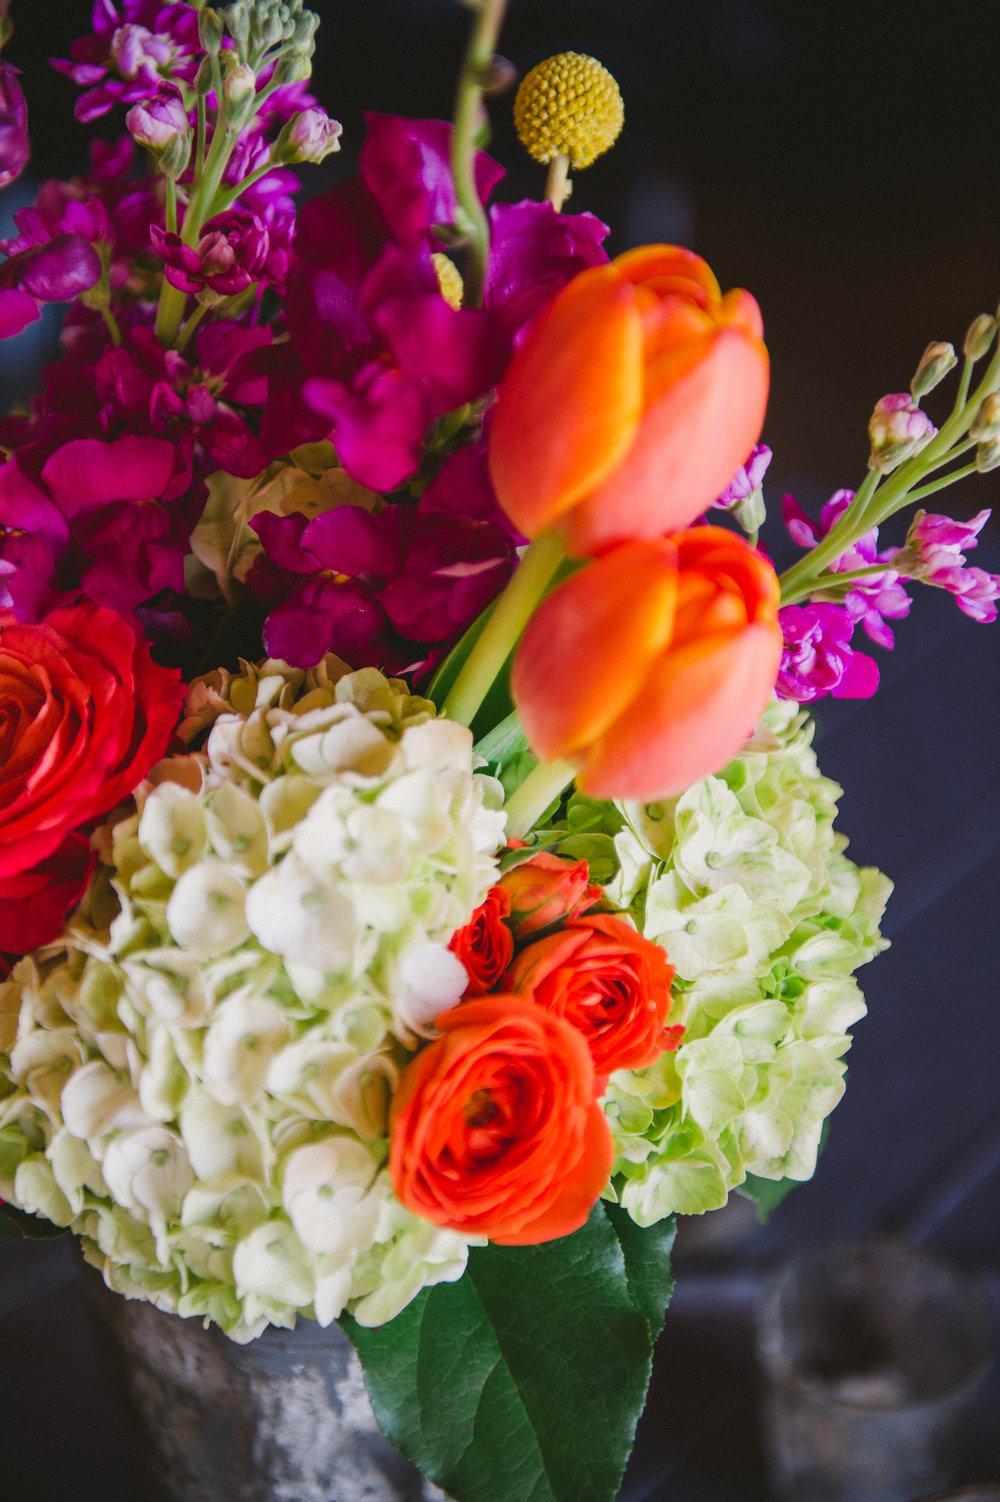 joy&jamiewedding-smitten&hooked-details-014.jpg